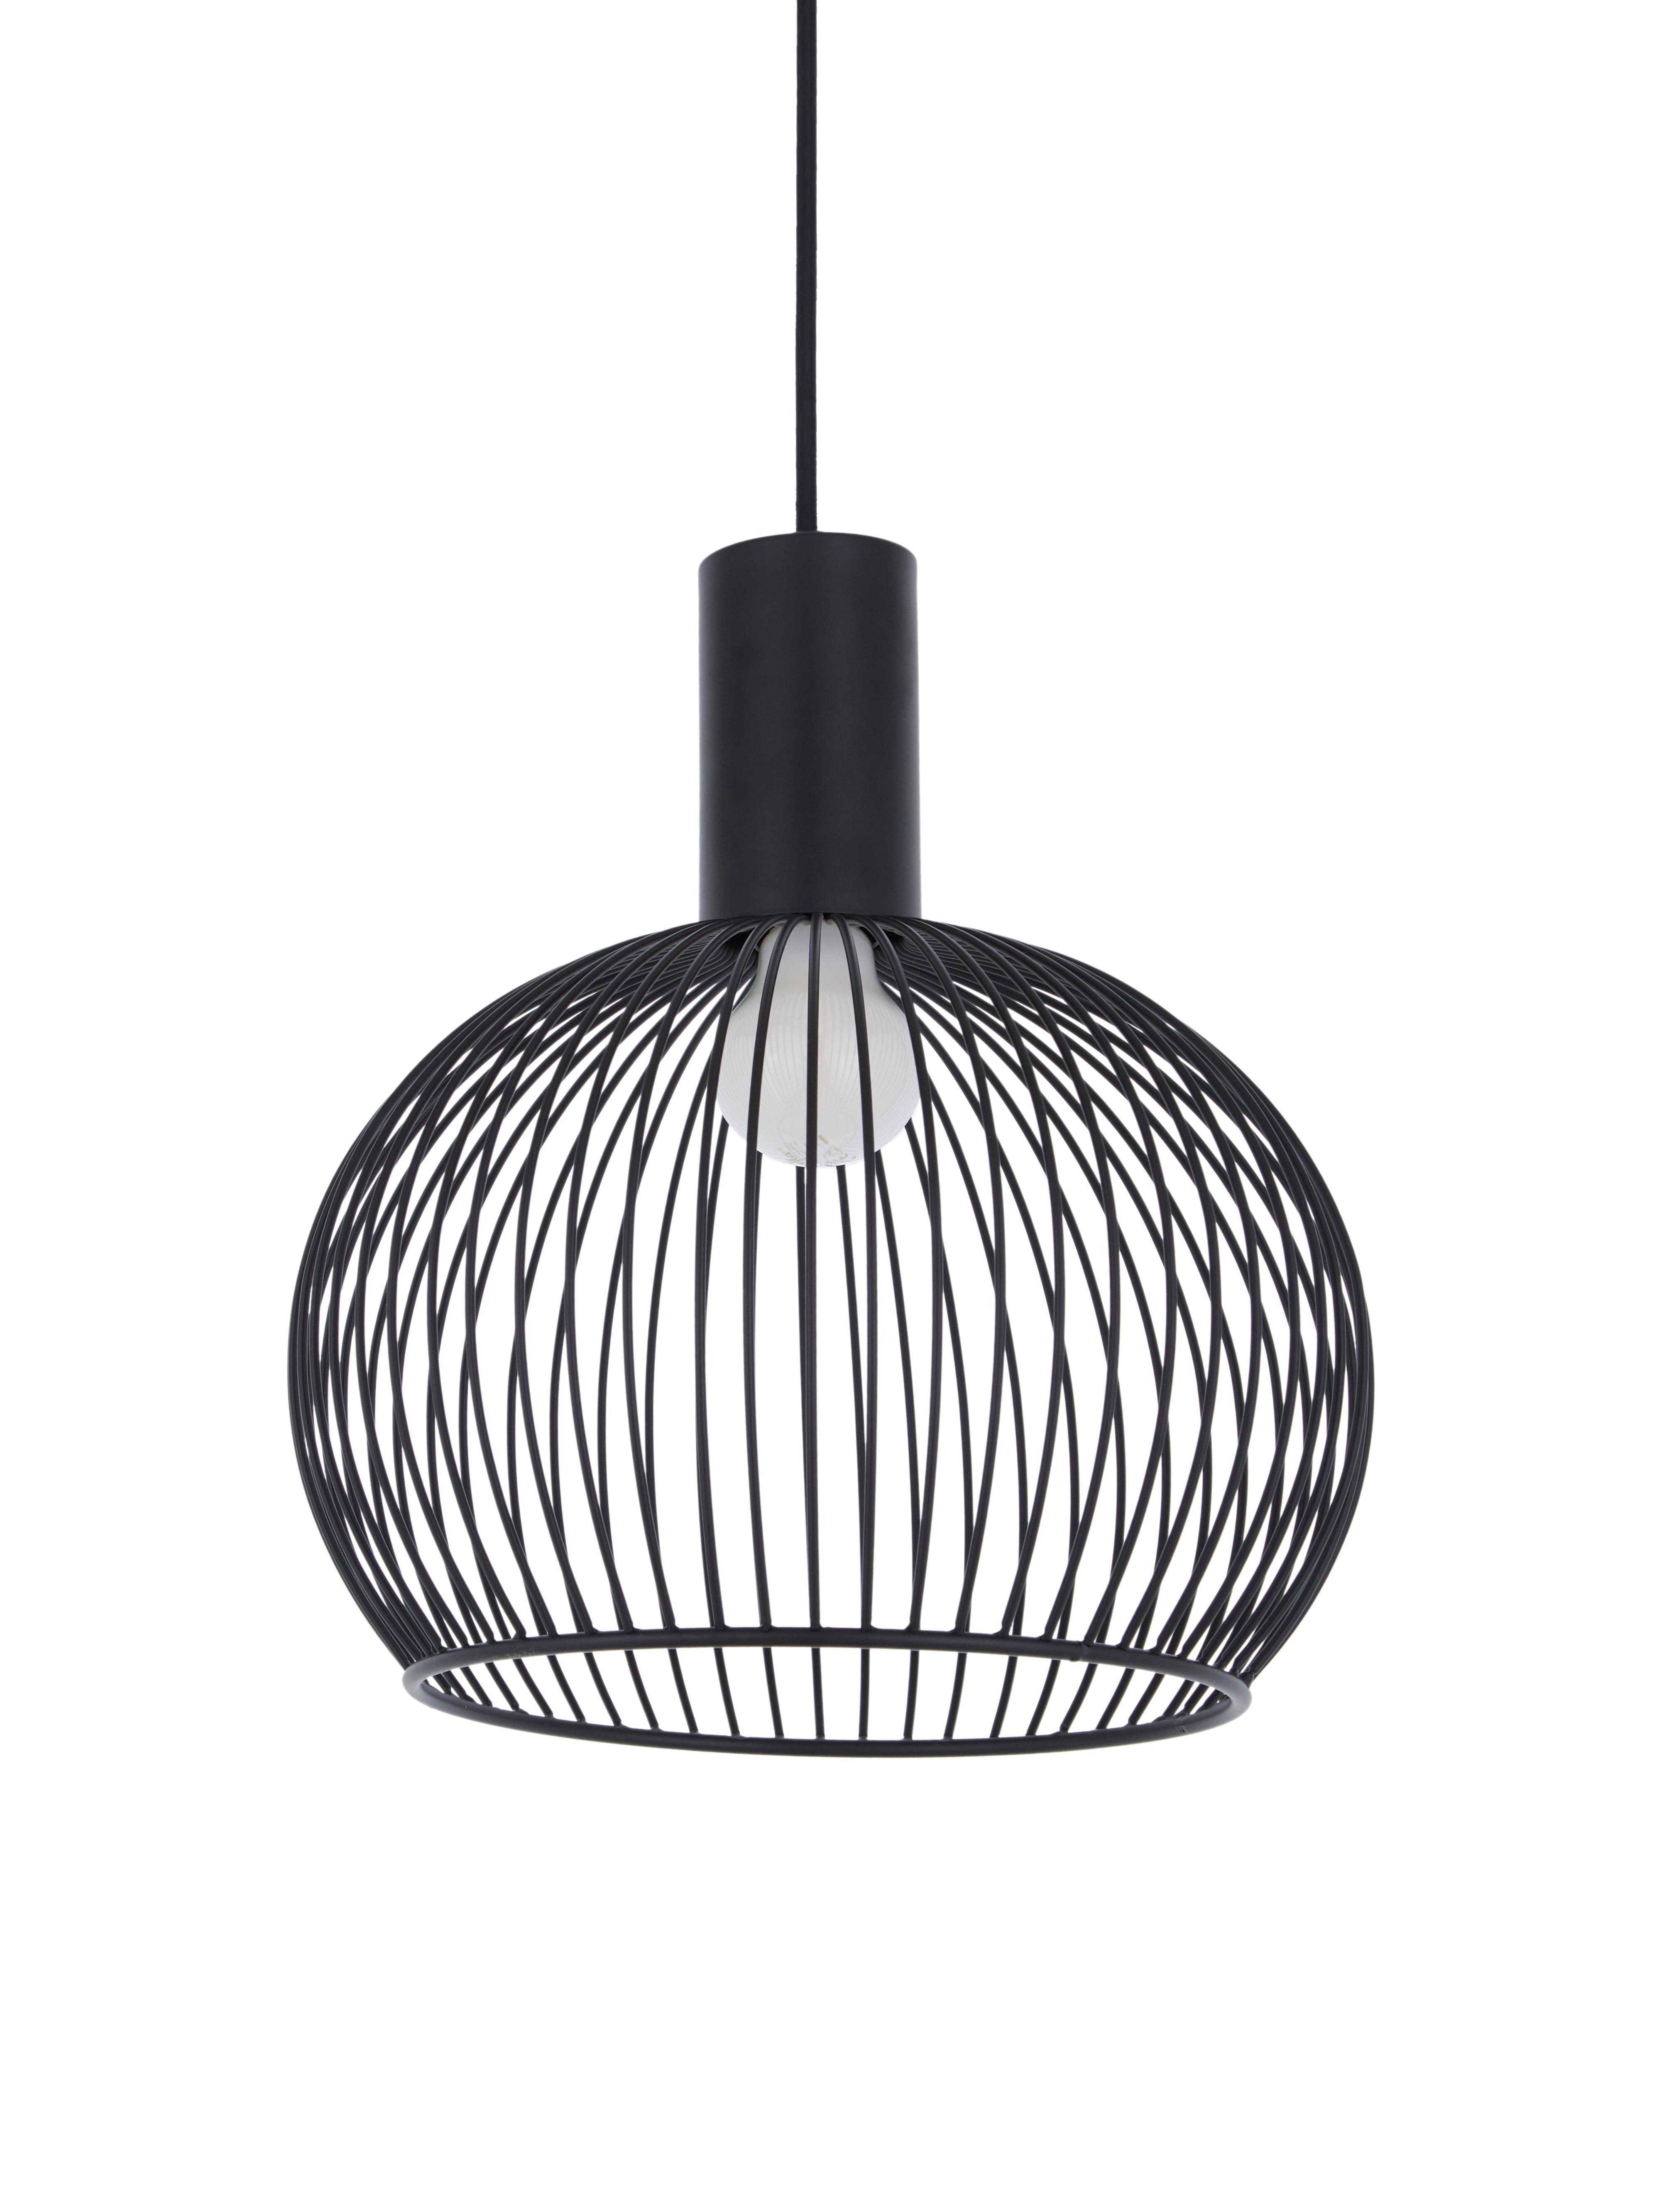 Design hanglamp Aver, Lampenkap: gelakt staal, Baldakijn: kunststof, Zwart, Ø 30 x H 35 cm